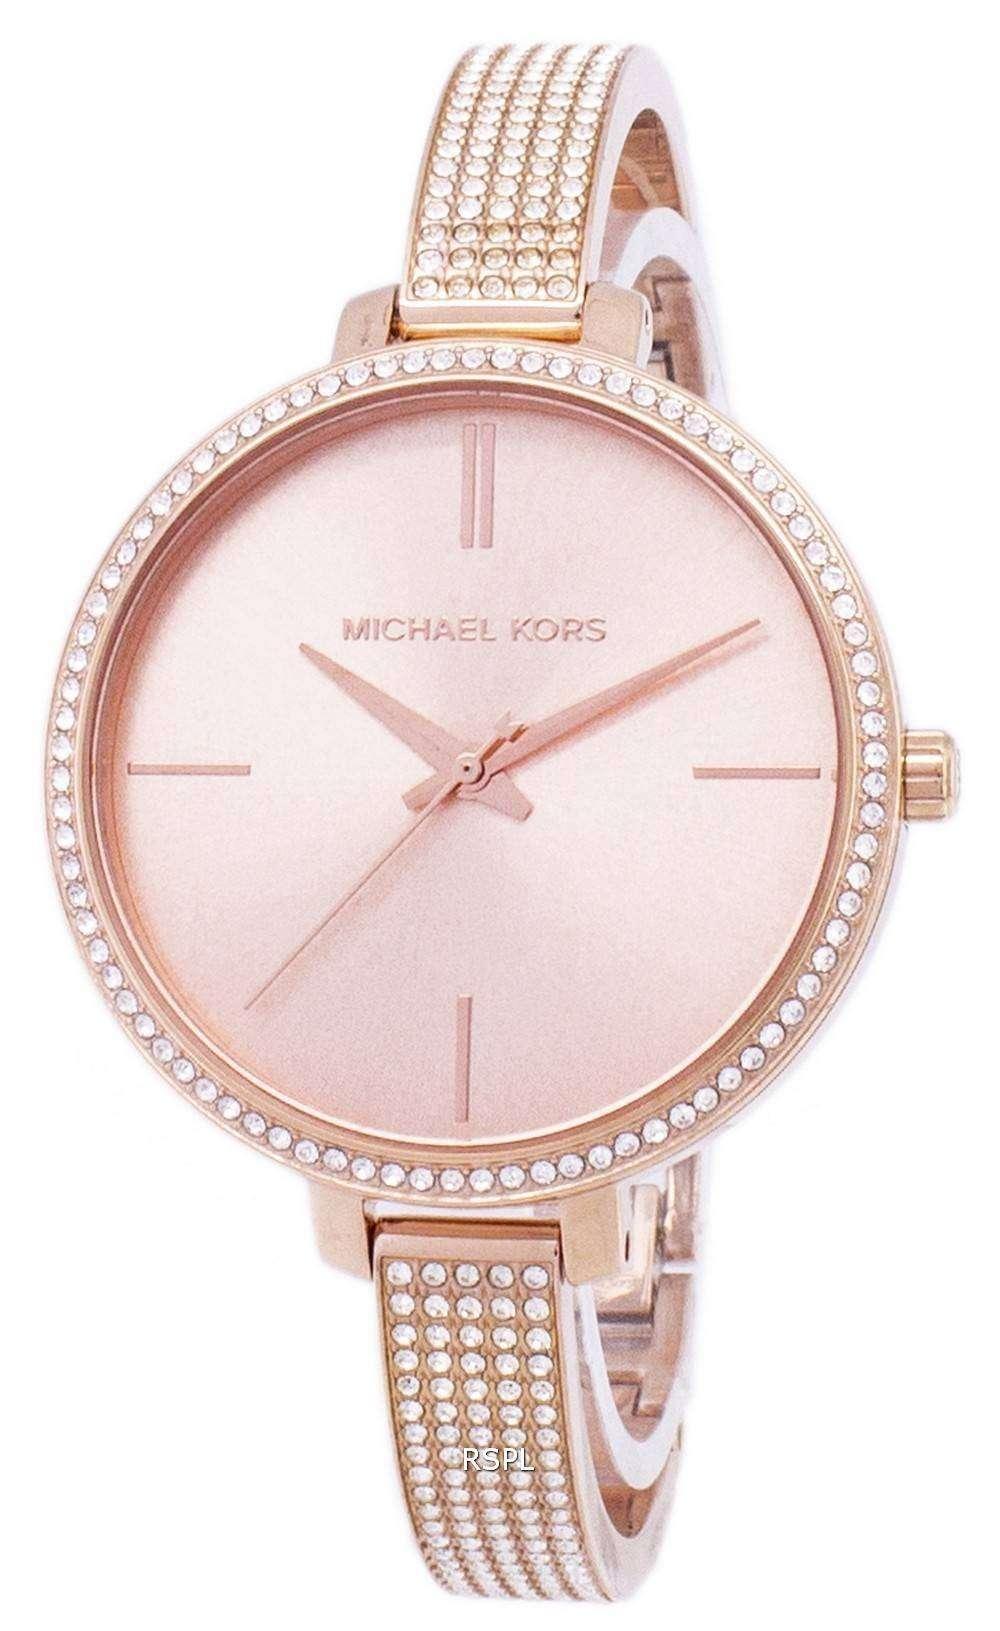 6b15b9e706ac Michael Kors Jaryn Quartz Diamond Accents MK3785 Women s Watch ...